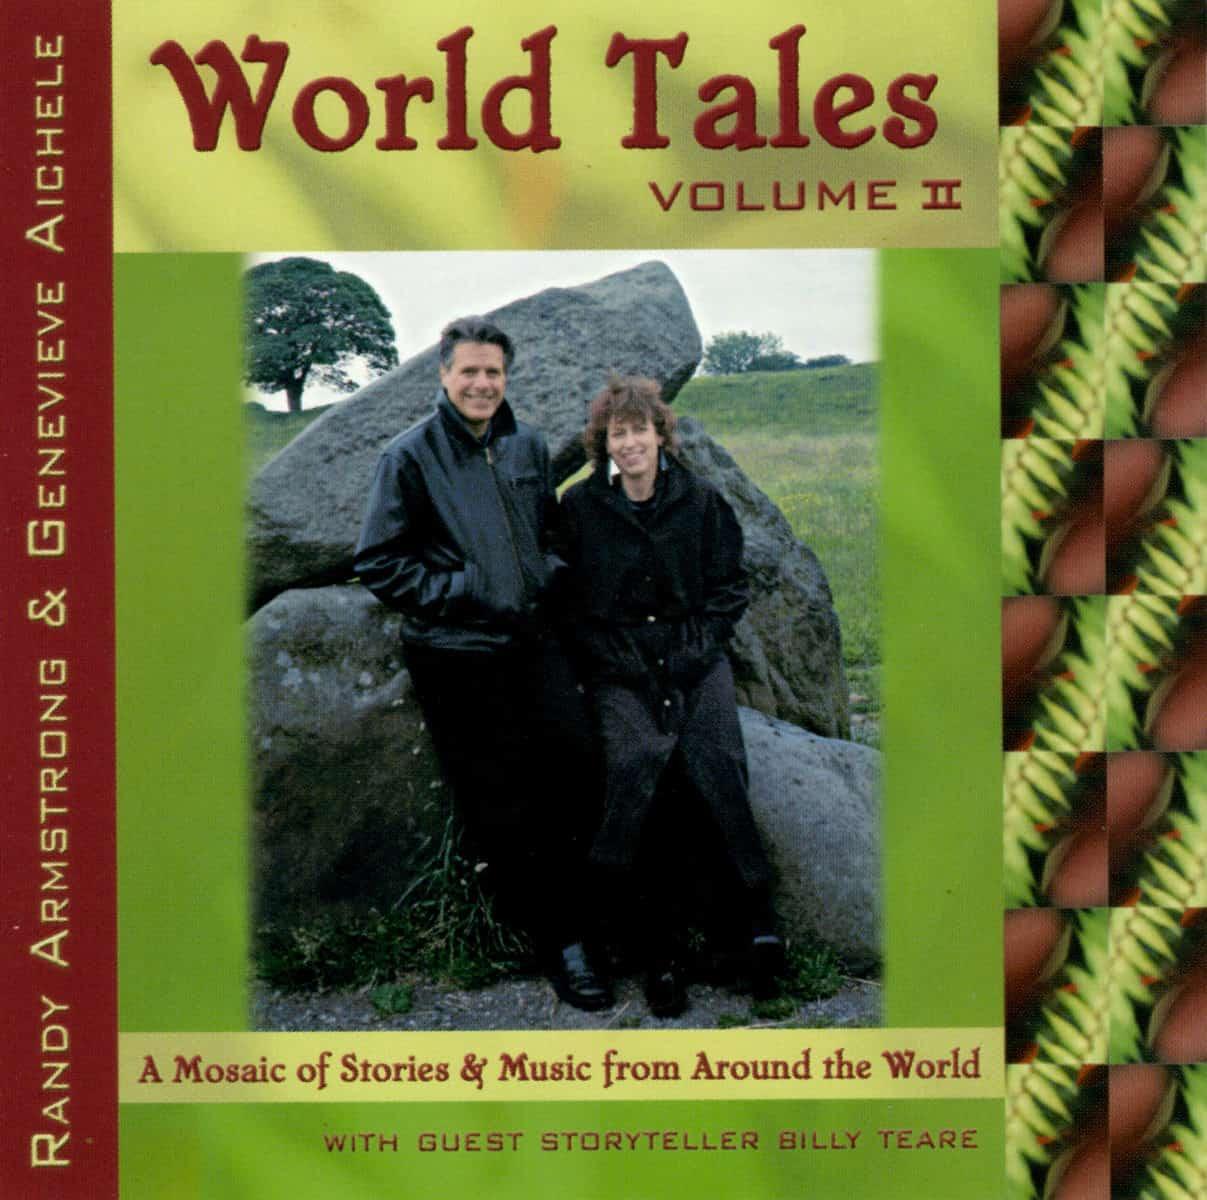 World Tales Volume II Awarded 2007 NAPPA Honors Award